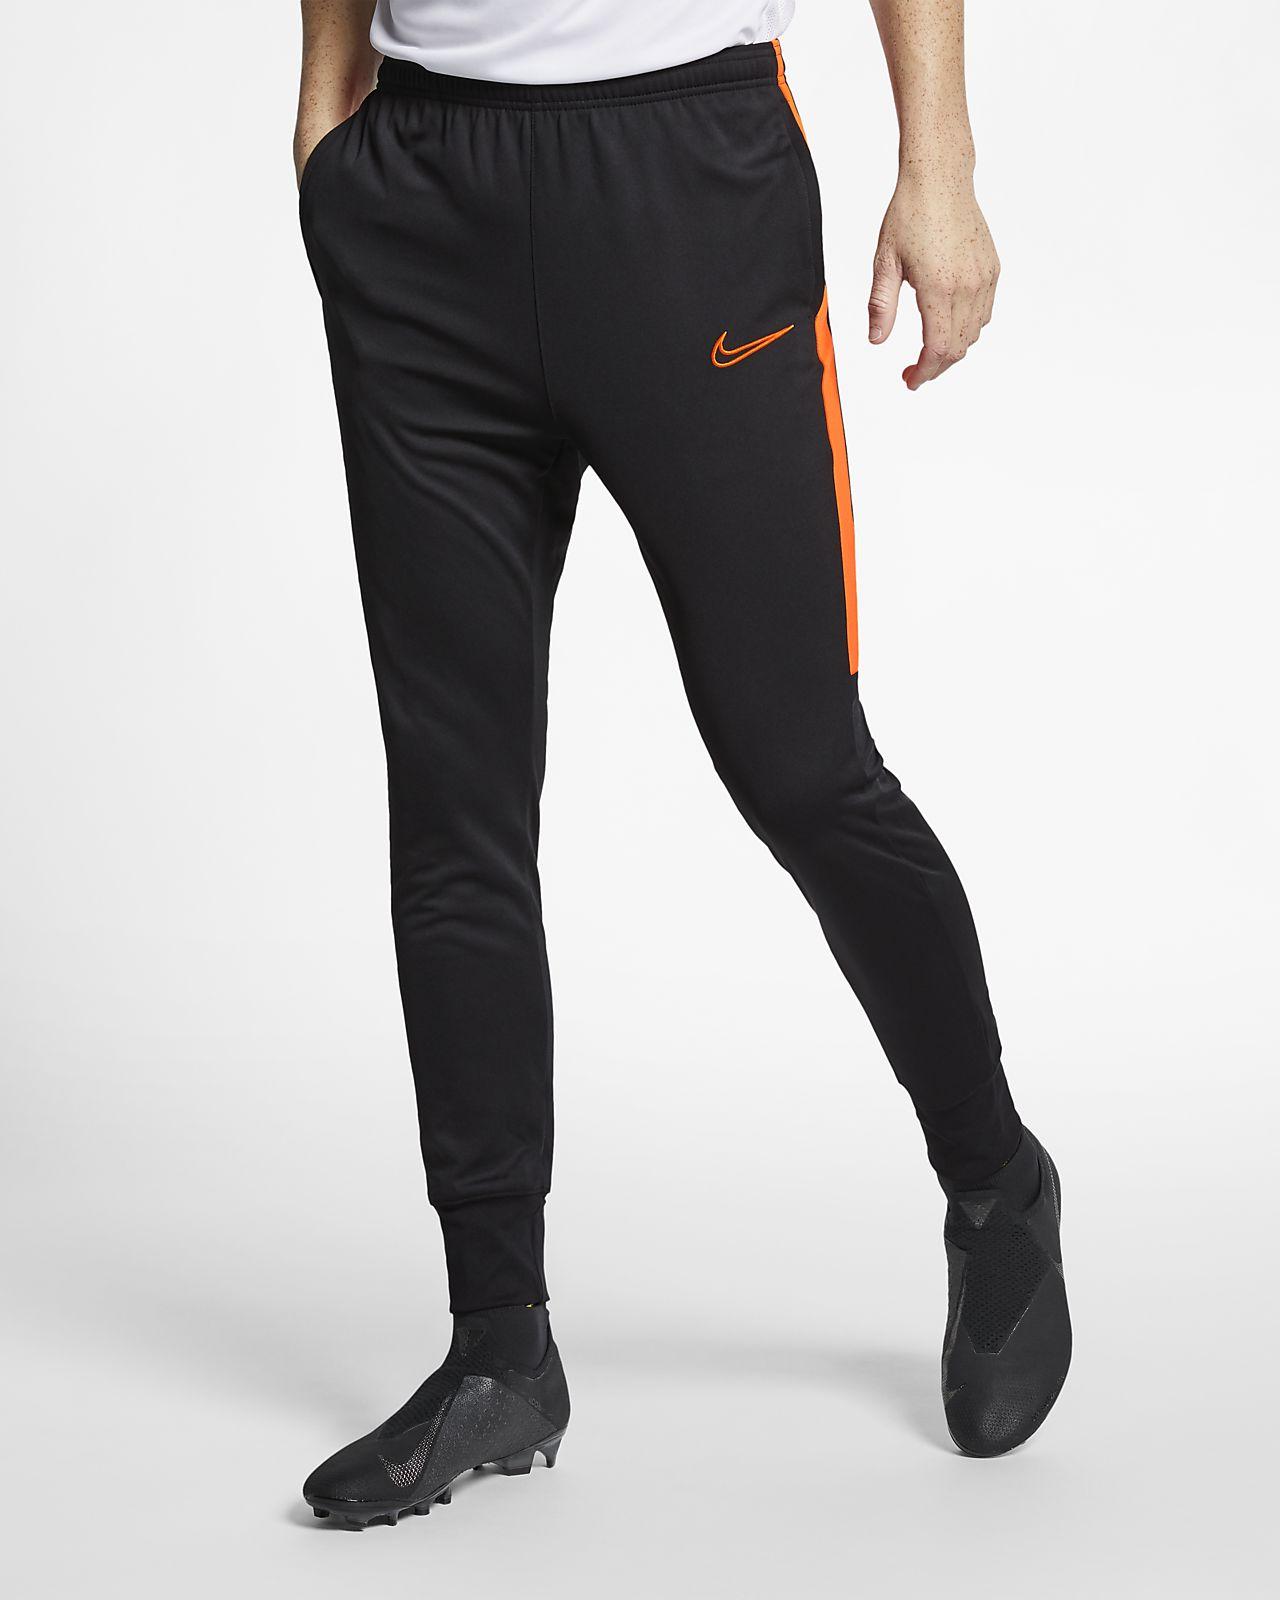 7638cf938f156 Nike Dri-FIT Academy Pantalón de fútbol - Hombre. Nike.com ES